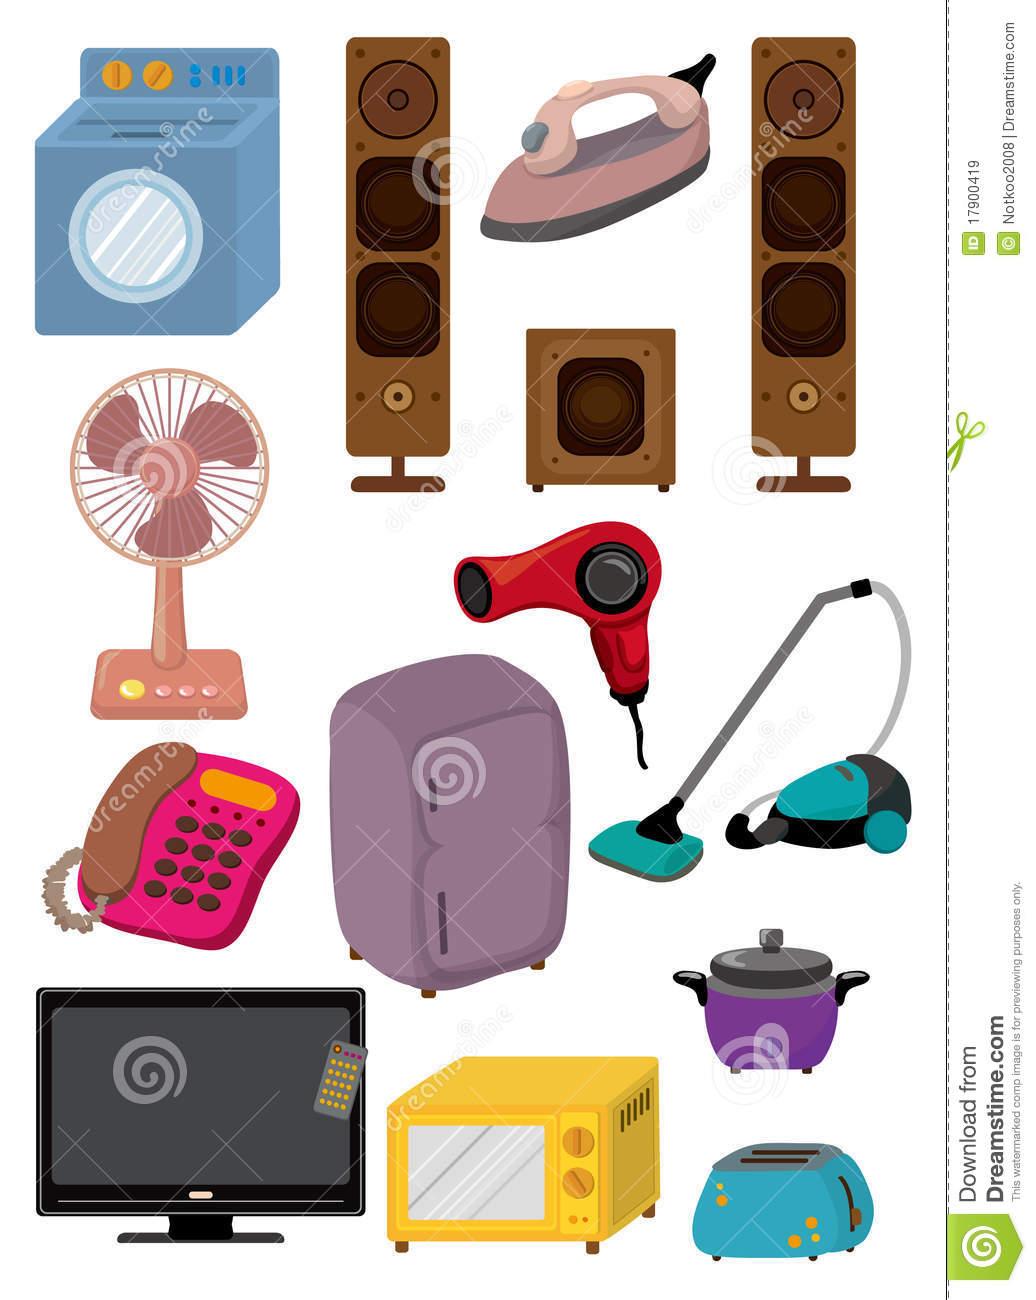 Cartoon Appliances Clipart.